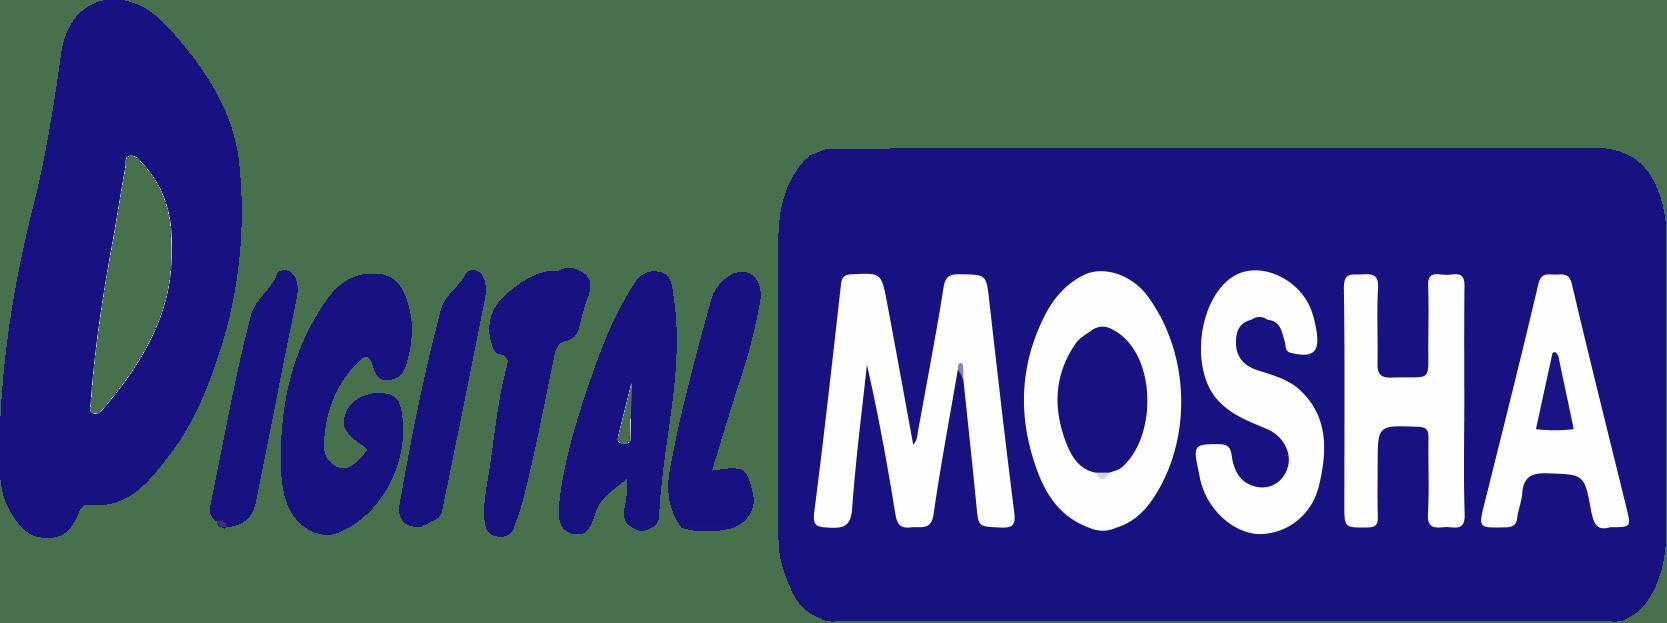 Digital Mosha